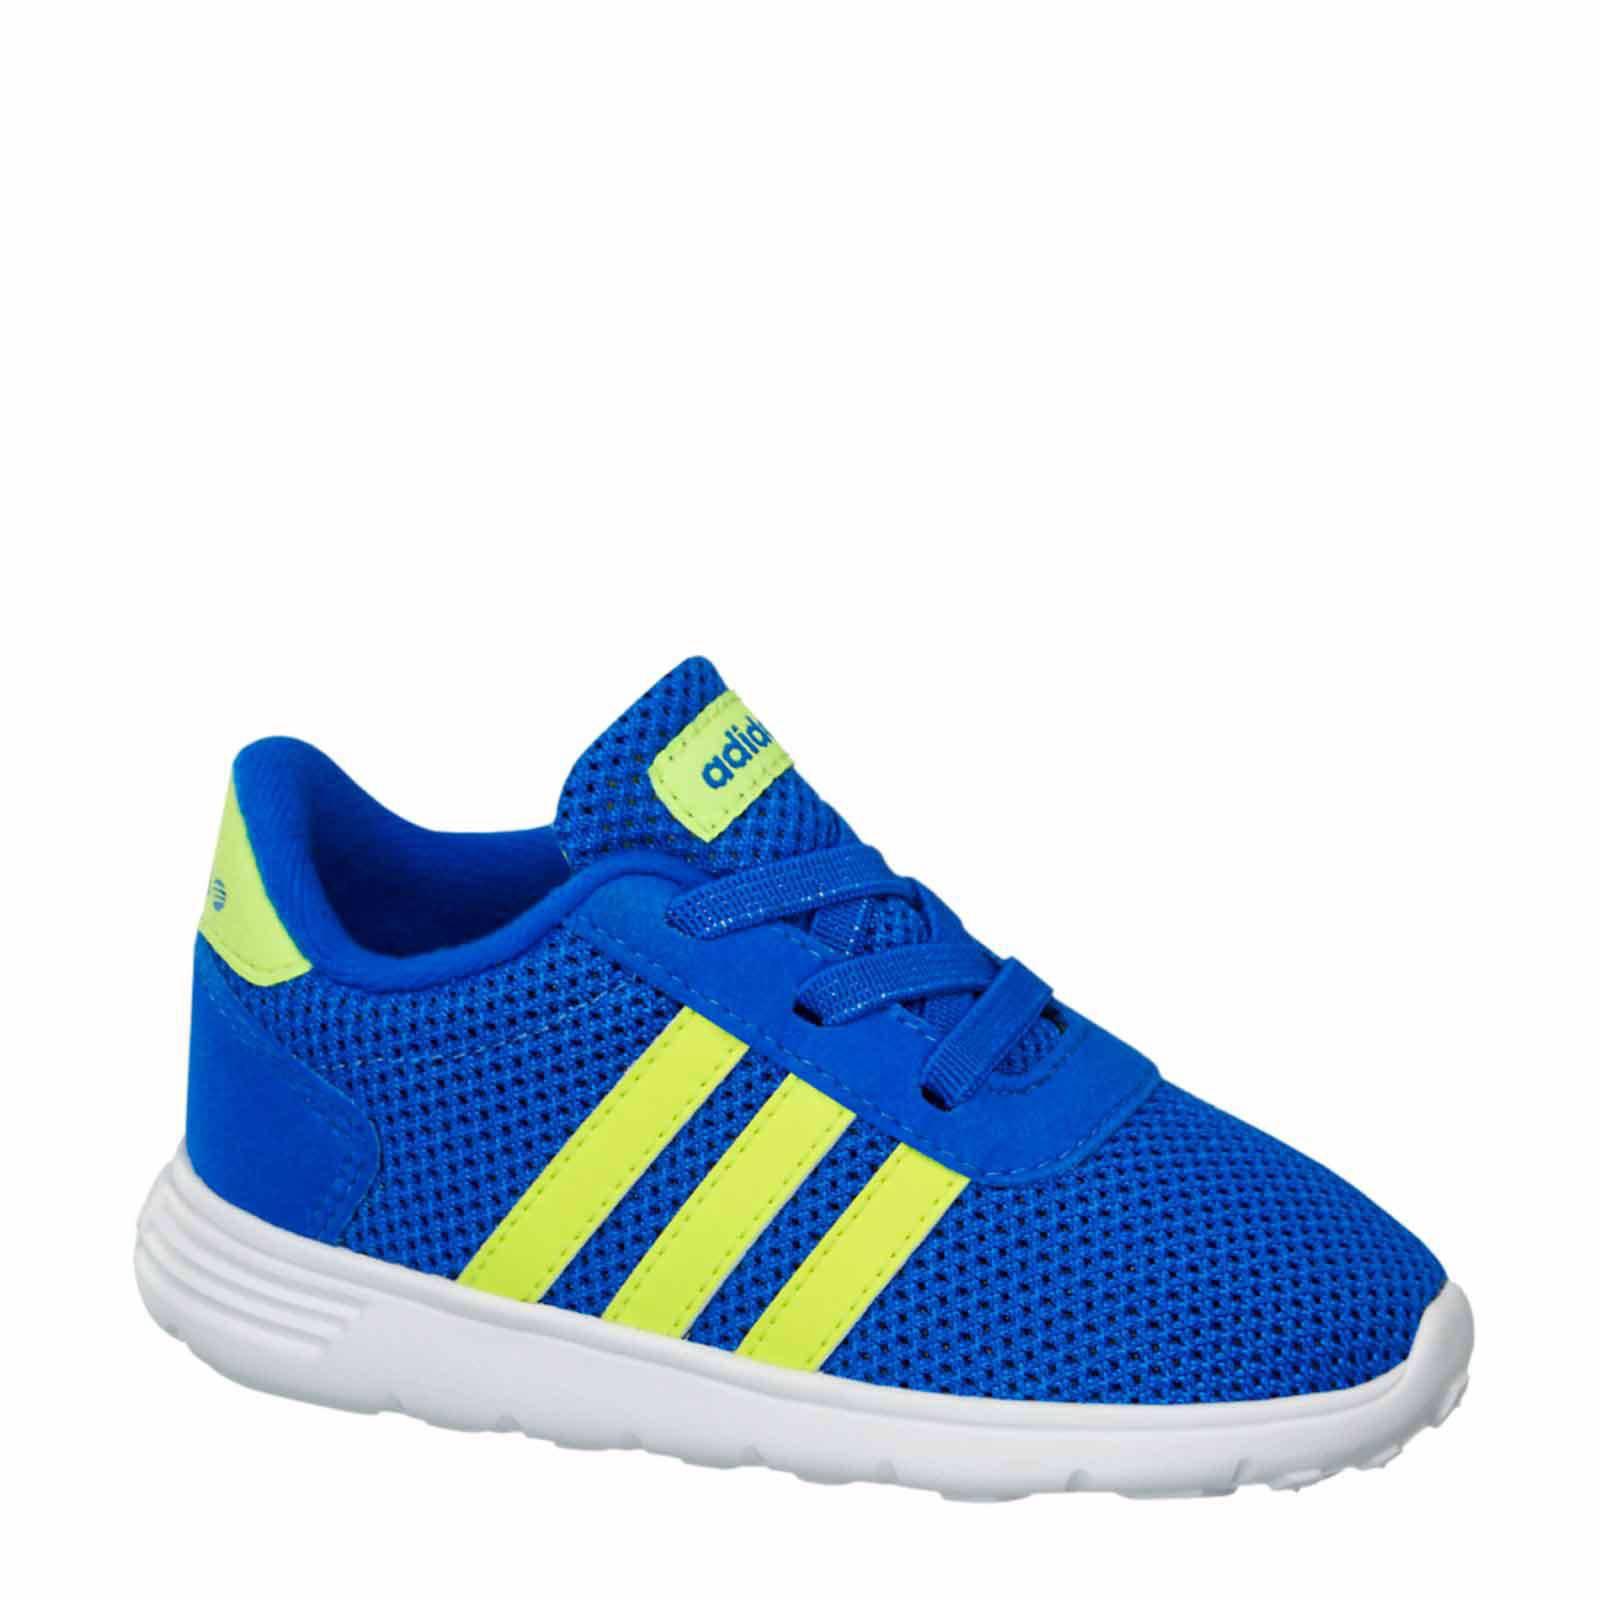 adidas neo schoenen blauw